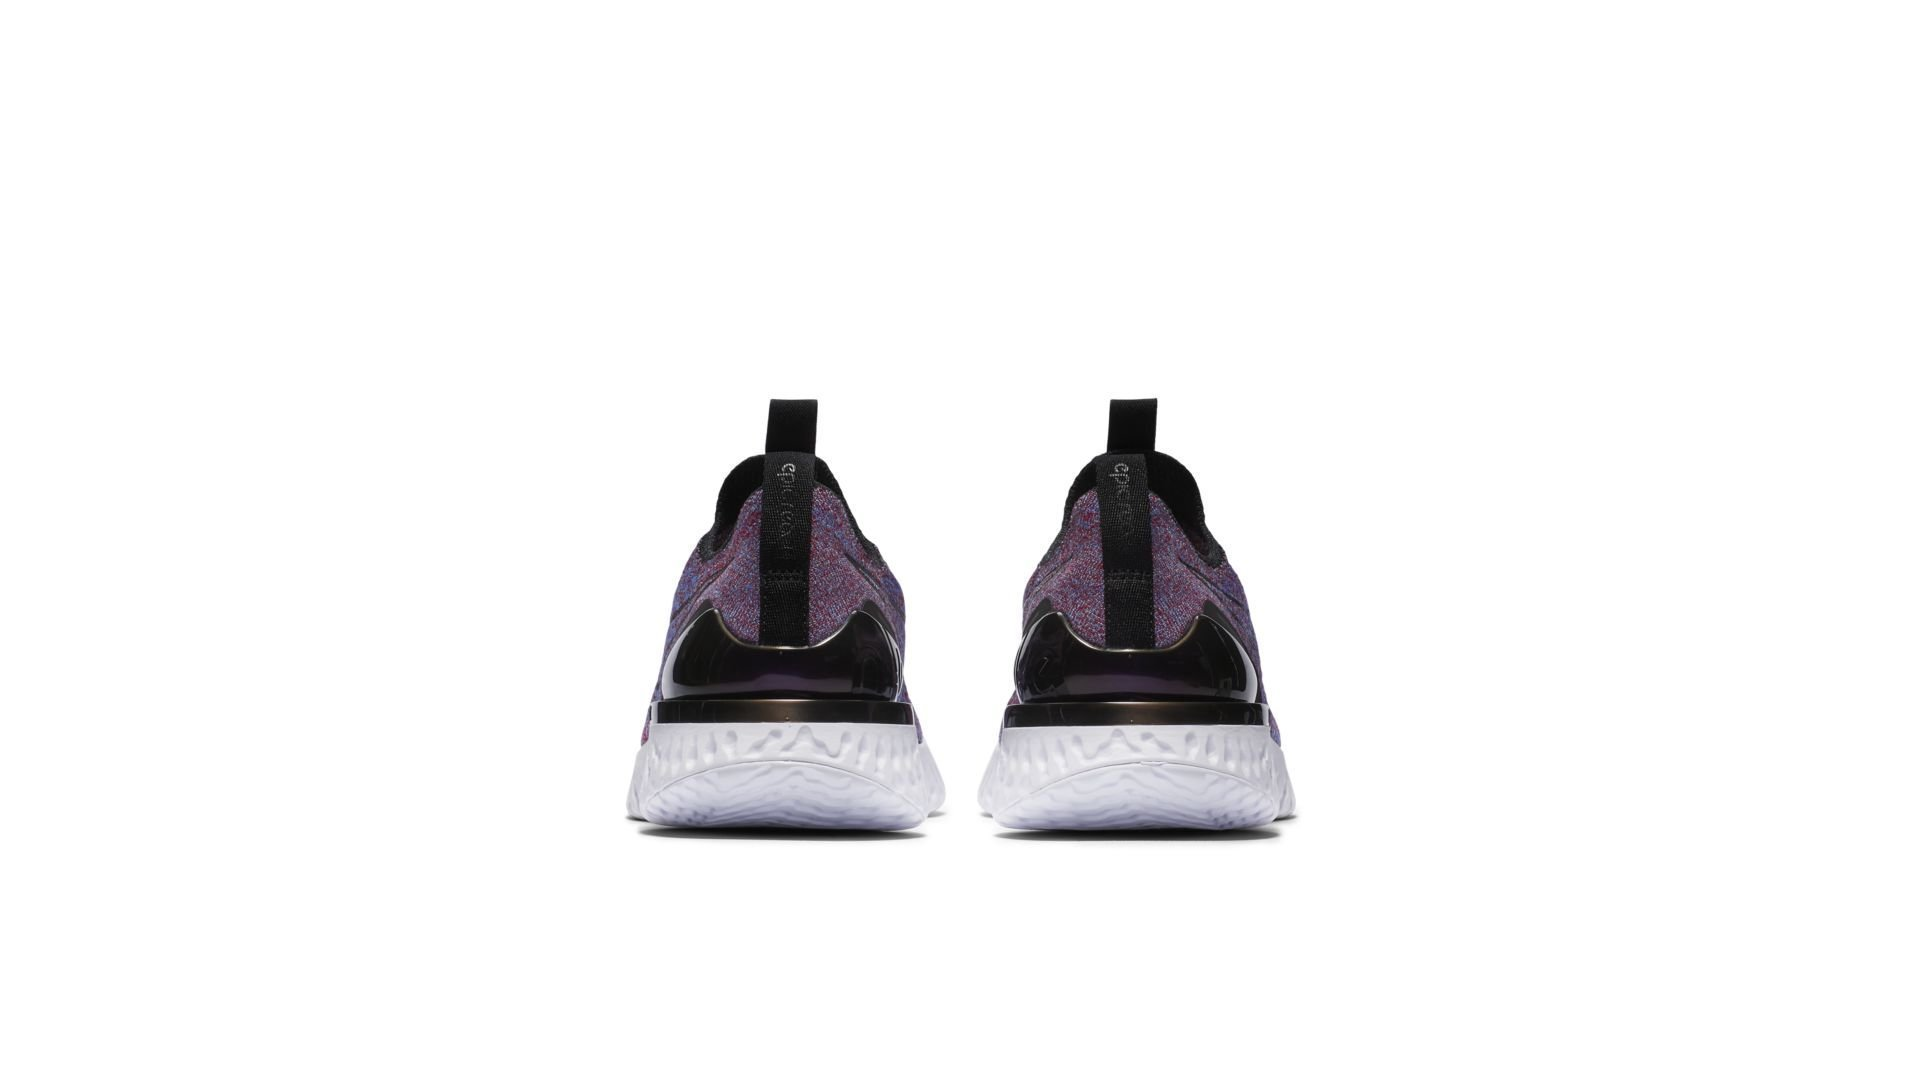 Nike Epic Phantom React Flyknit Black University Red Hyper Jade (W) (BV0415-002)